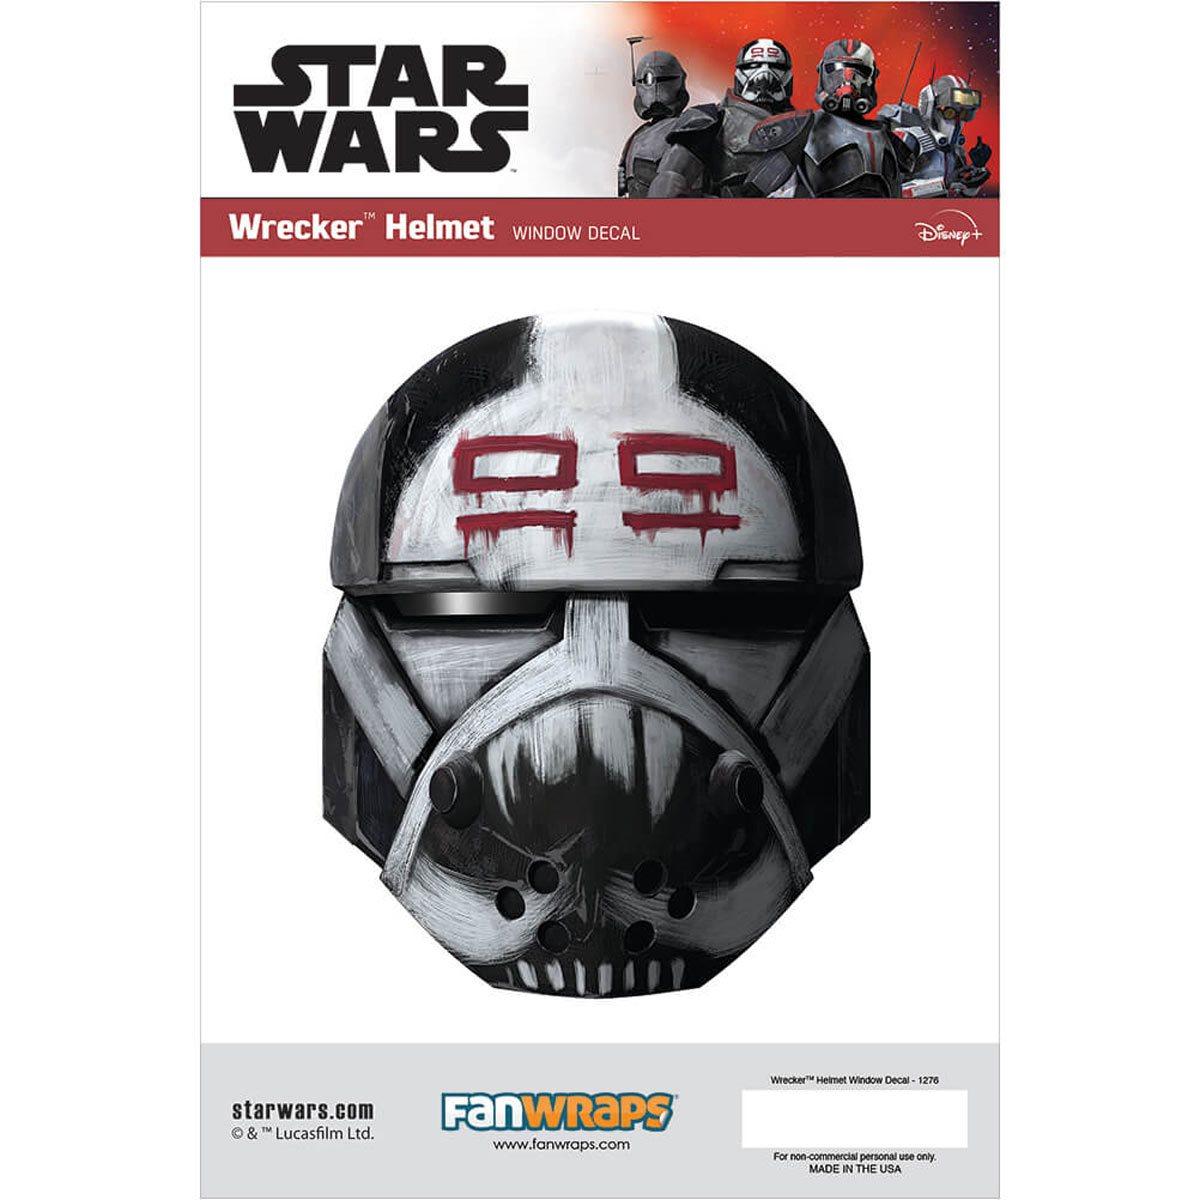 Star Wars Wrecker Helmet Window Decal画像